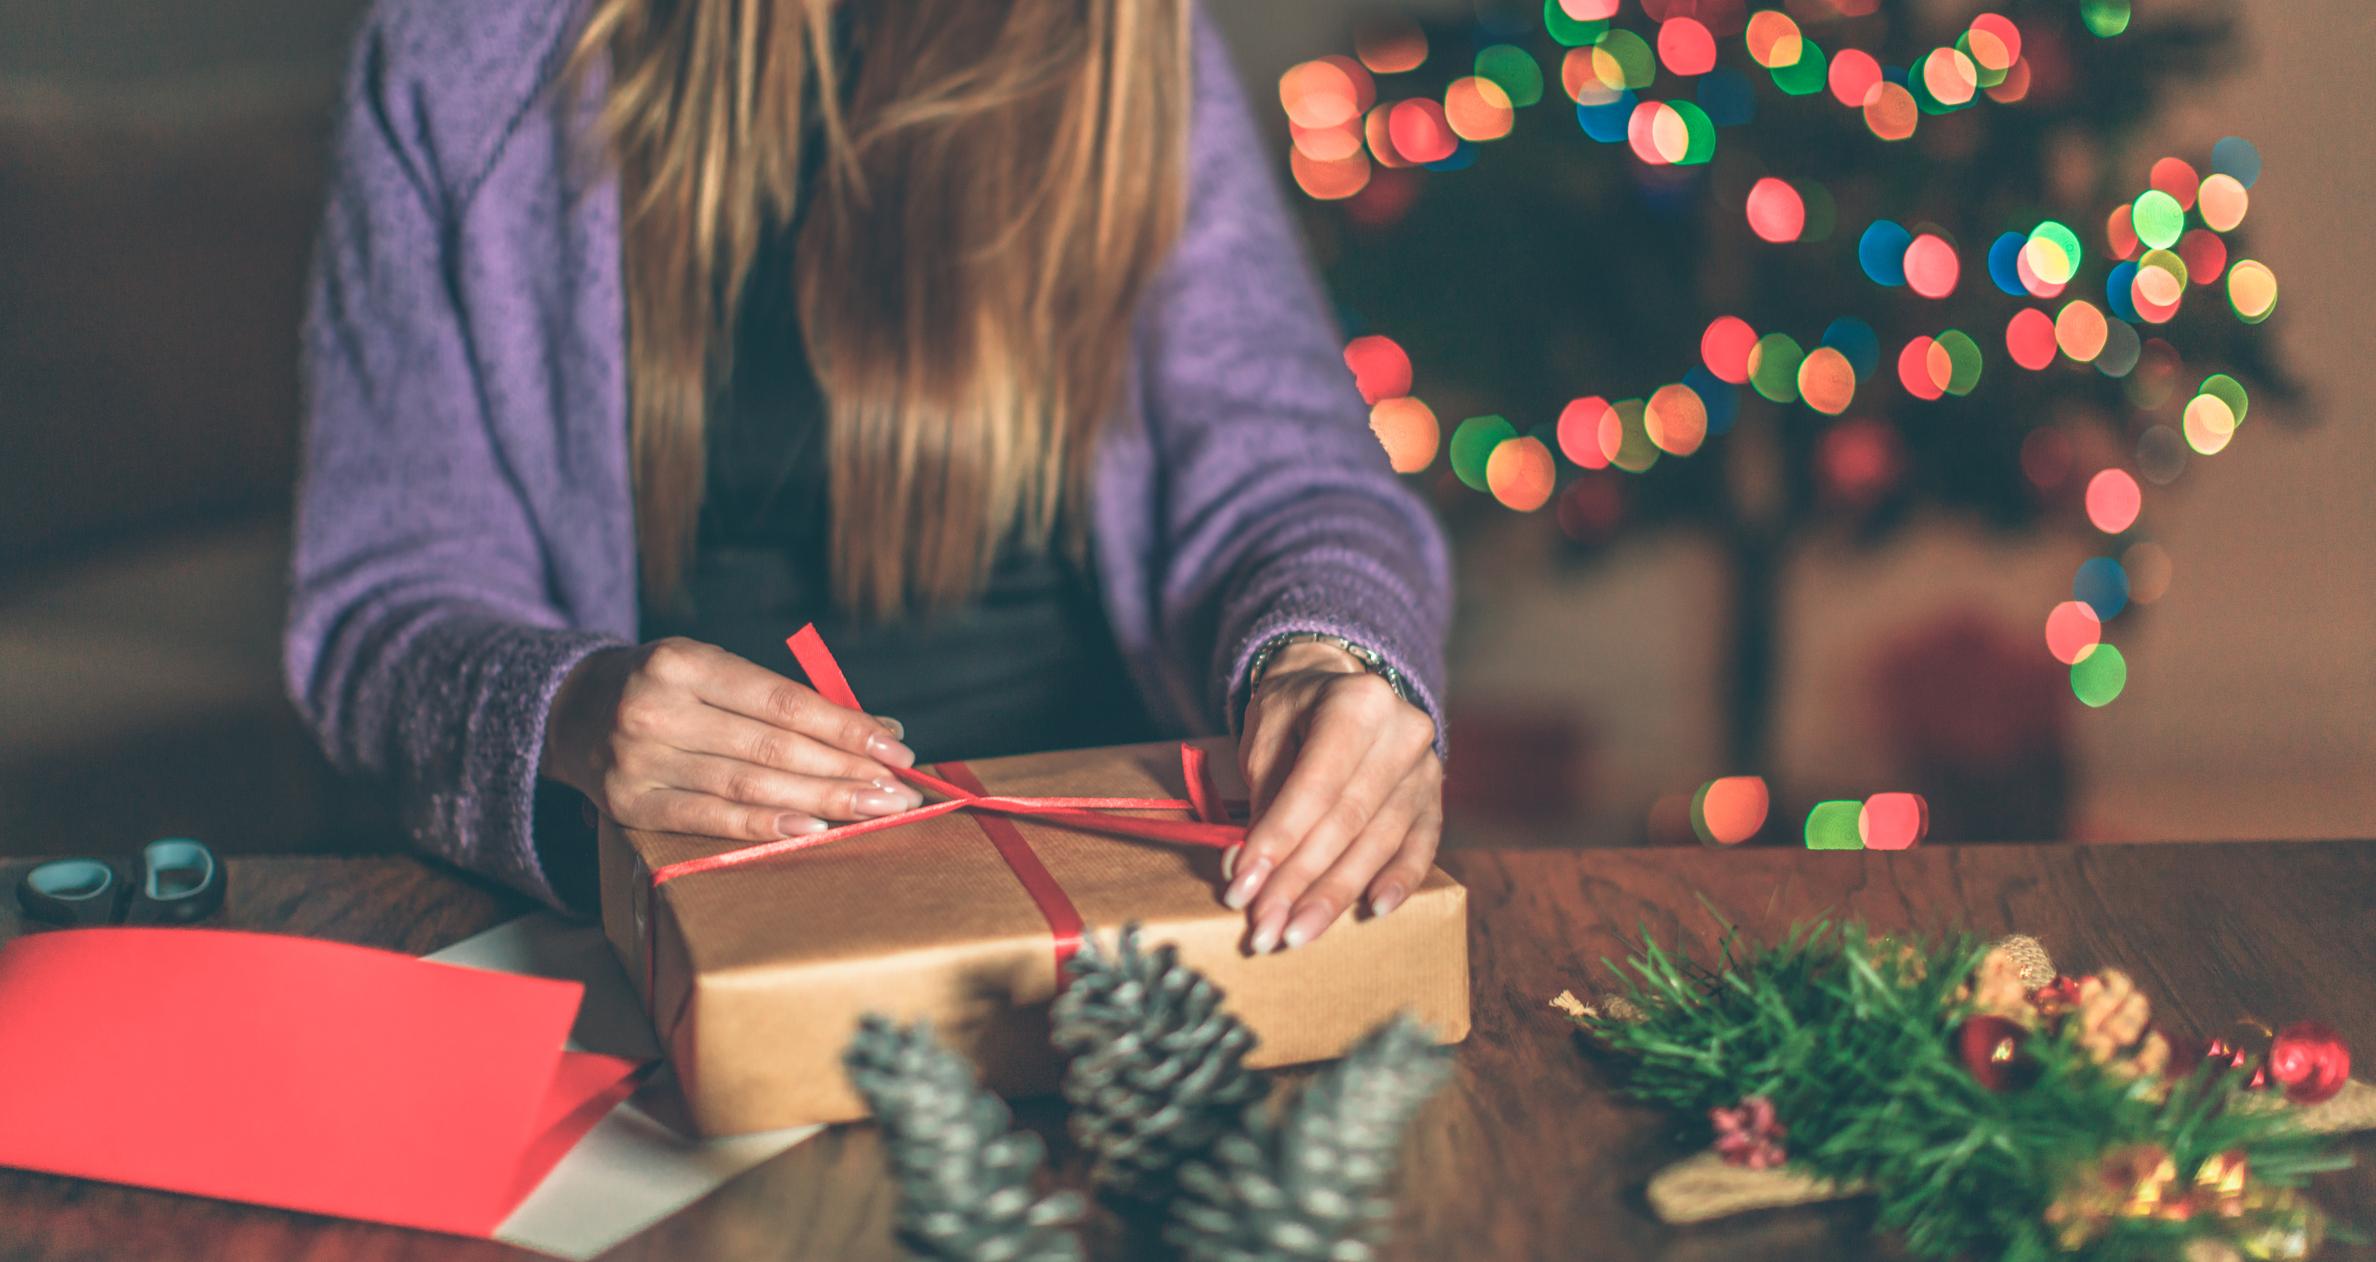 Teacher Christmas Gift Ideas that Won't Break the Bank